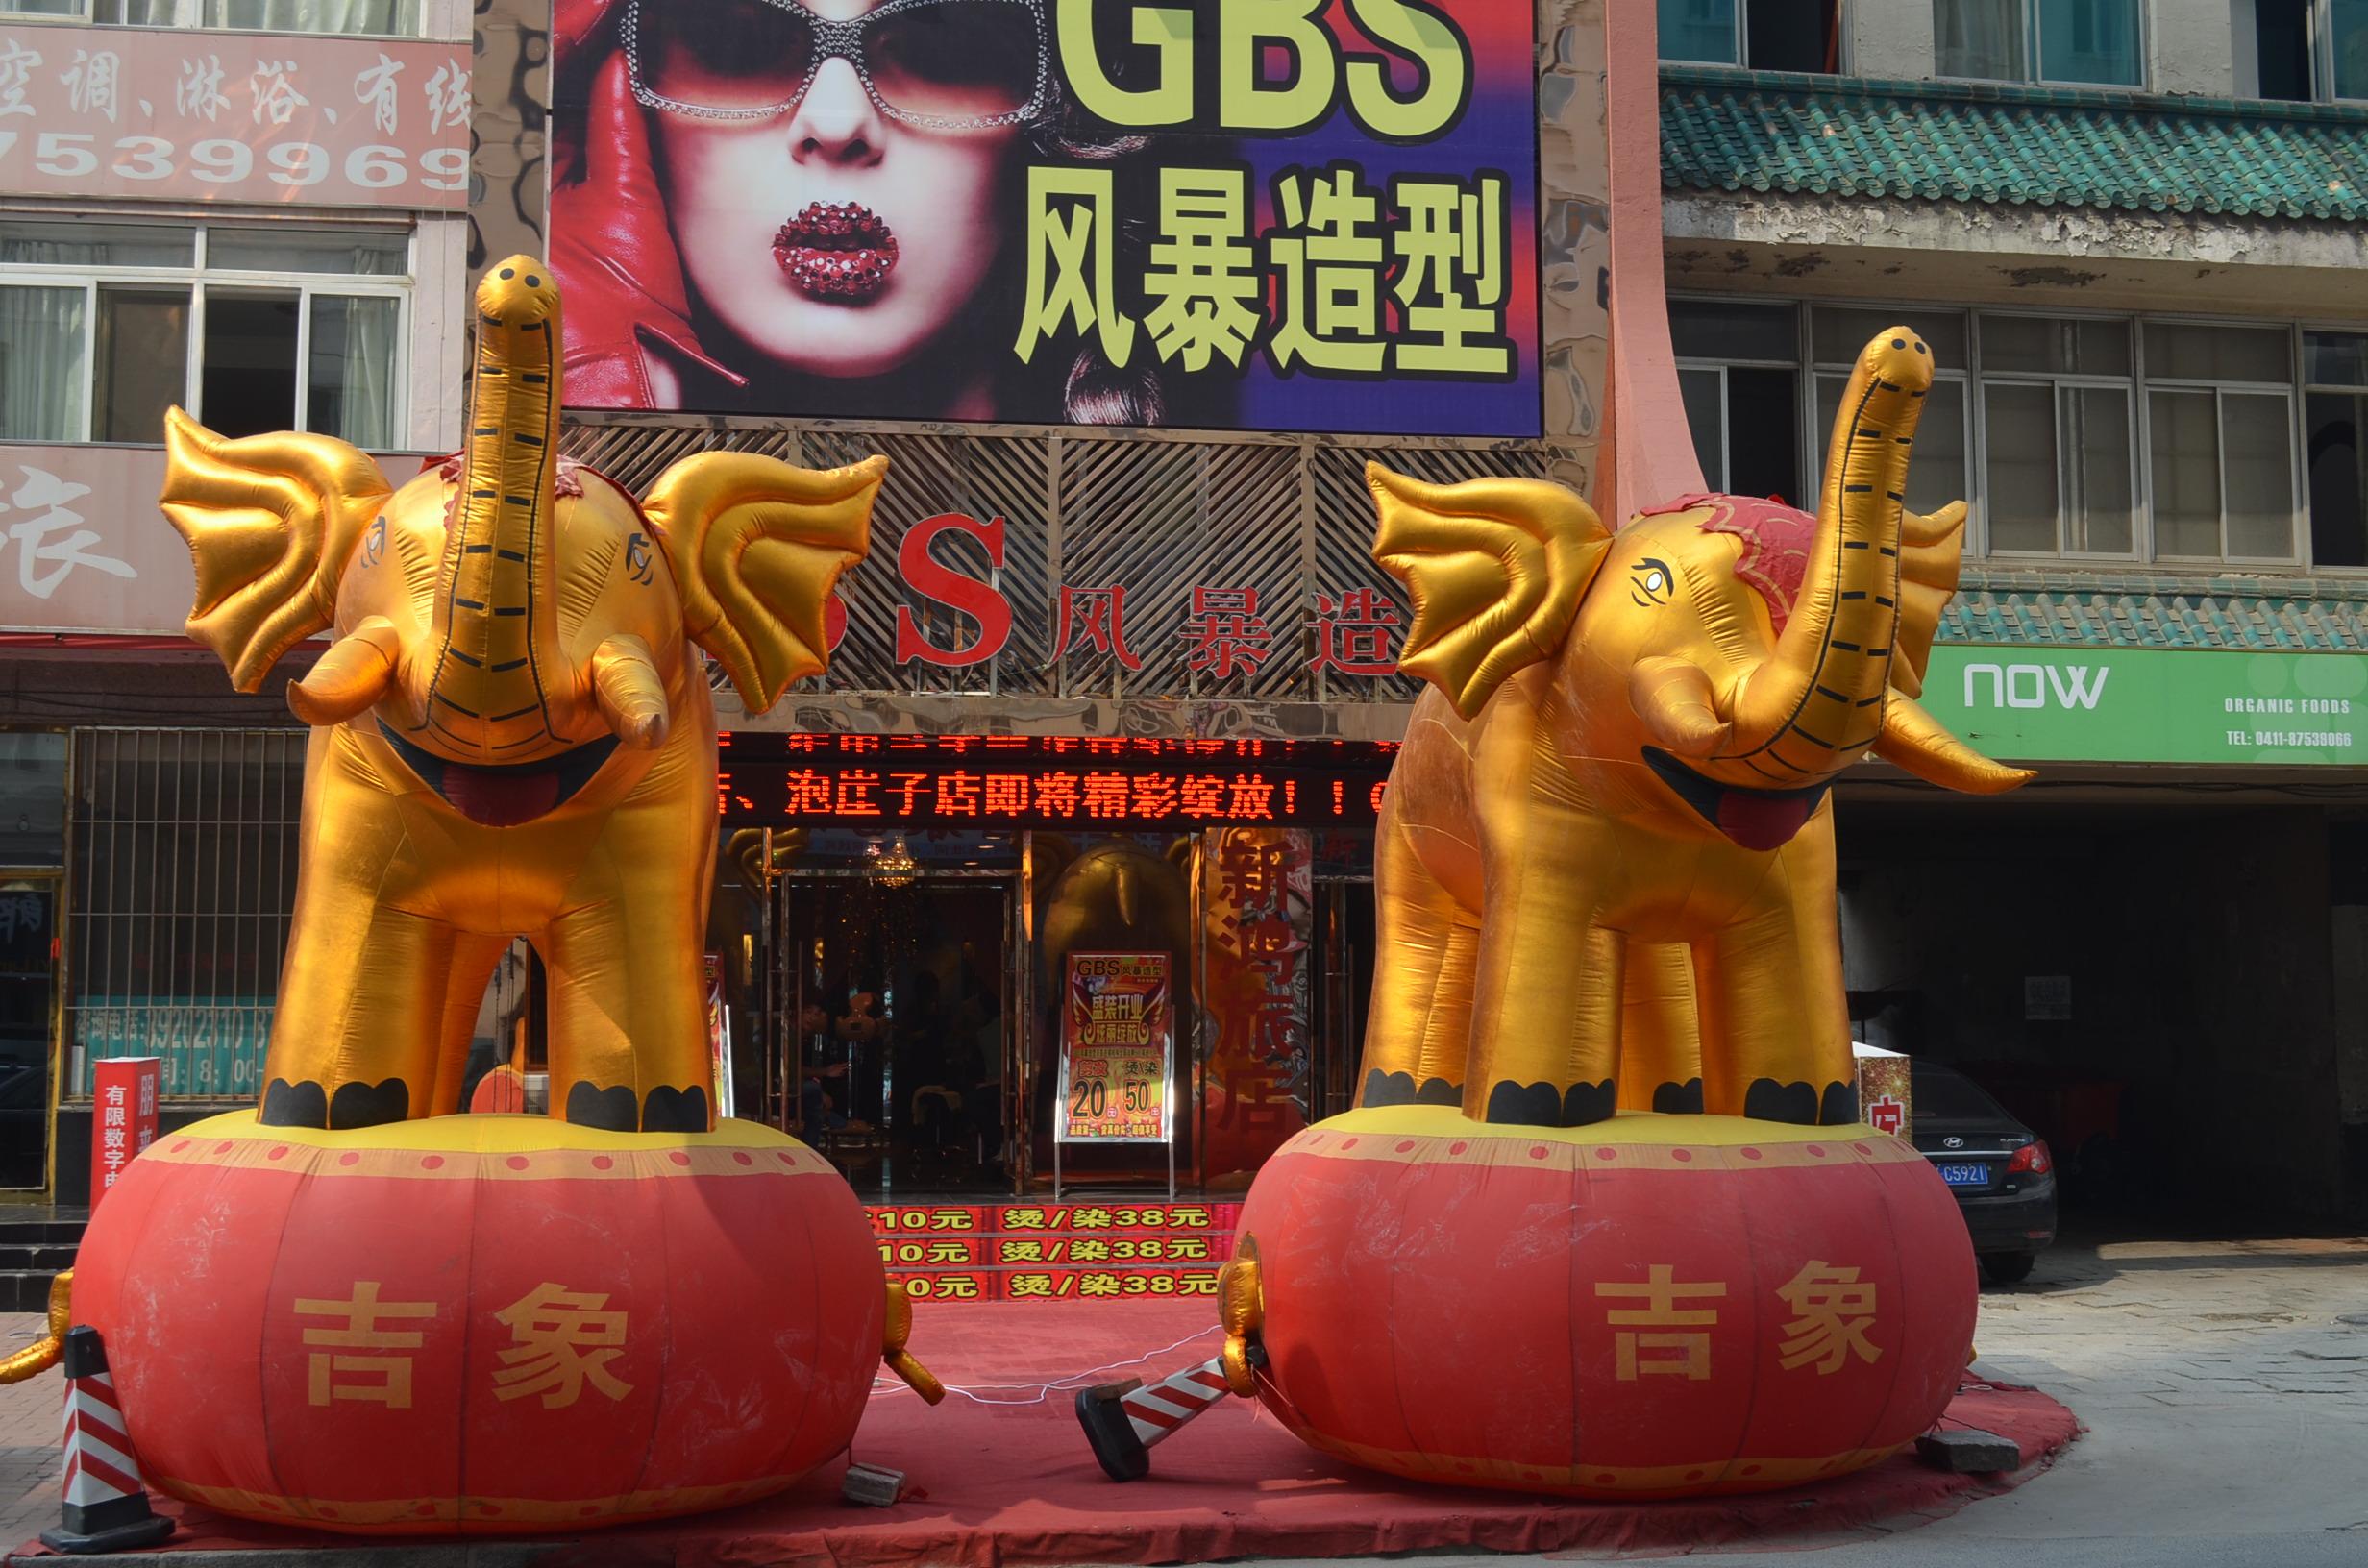 Description: http://neuage.files.wordpress.com/2012/08/gold-elephants.jpg